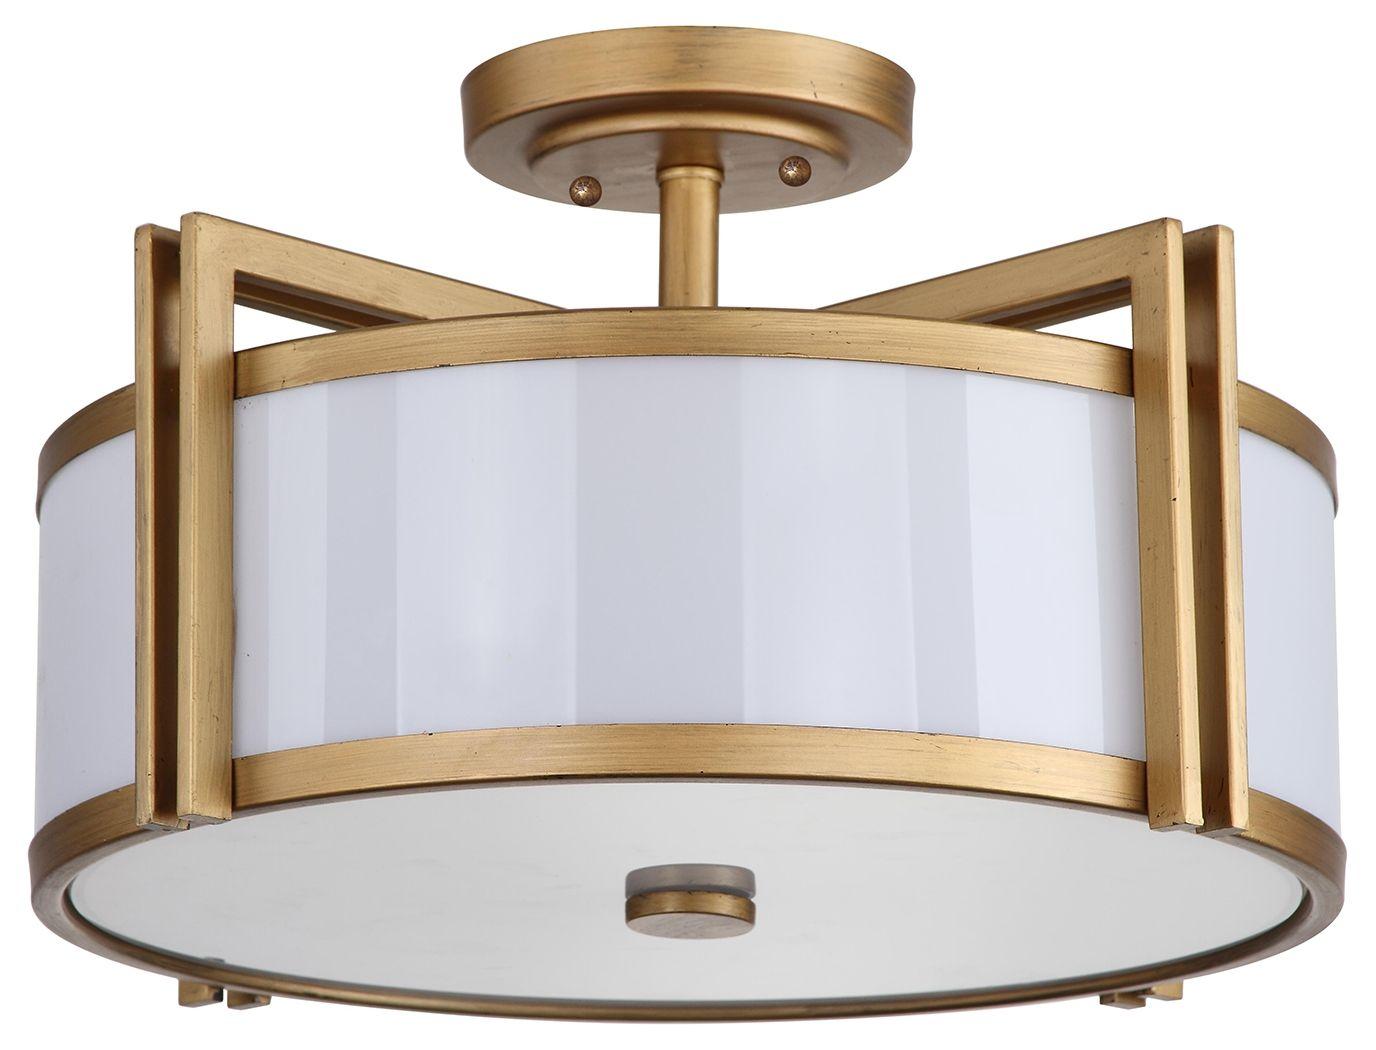 Acrylic Orb 17 15 Flush Mount Pendant Light Ashley Furniture Homestore Gold Ceiling Light Ceiling Lights Semi Flush Mount Lighting